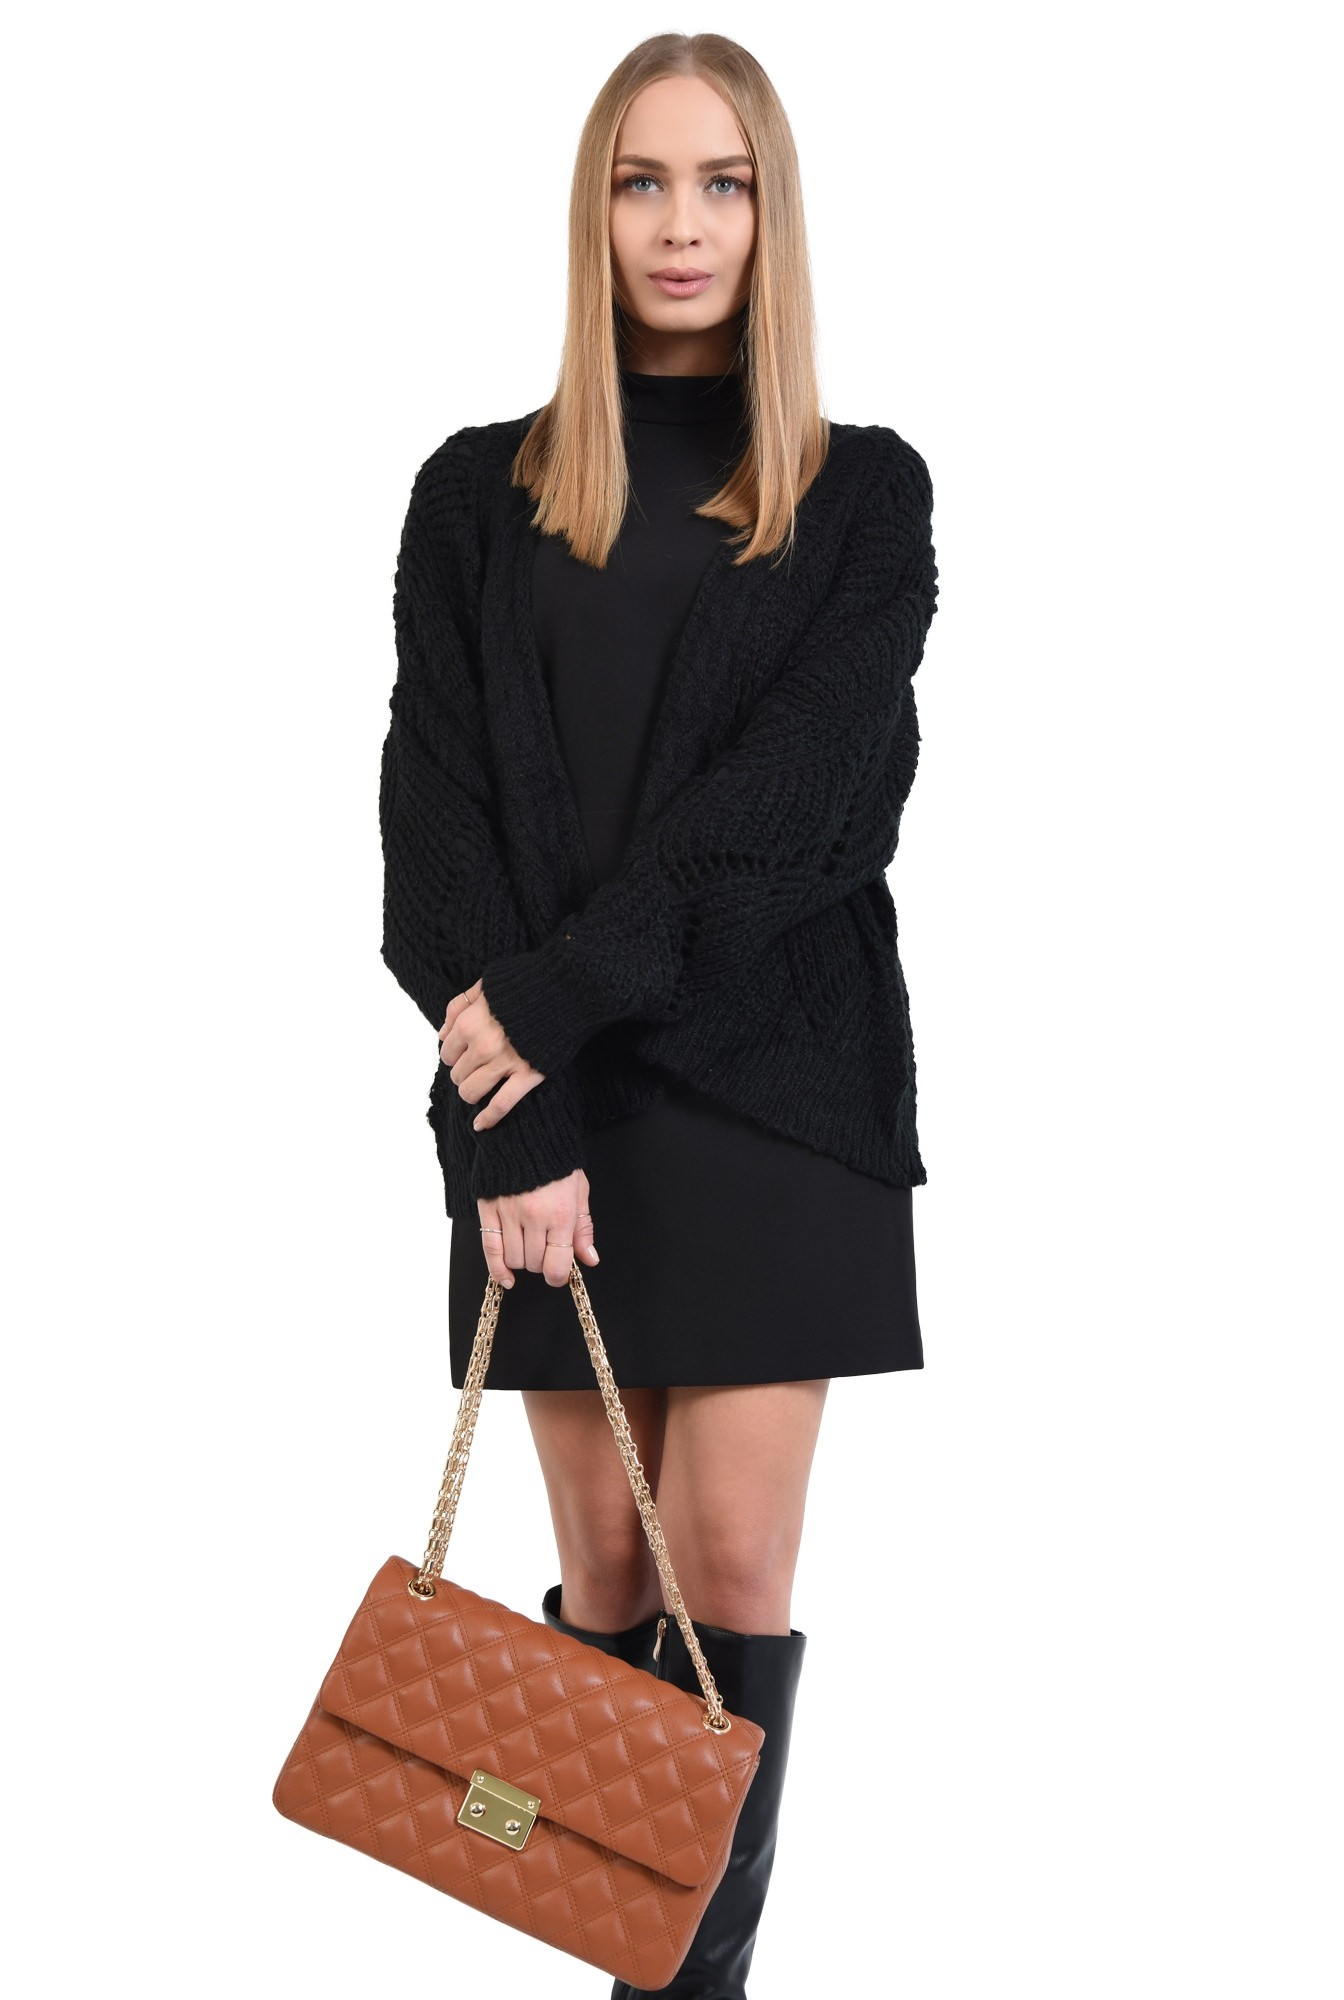 pulover cu gaurele, motive ajurate, maneci bufante, negru